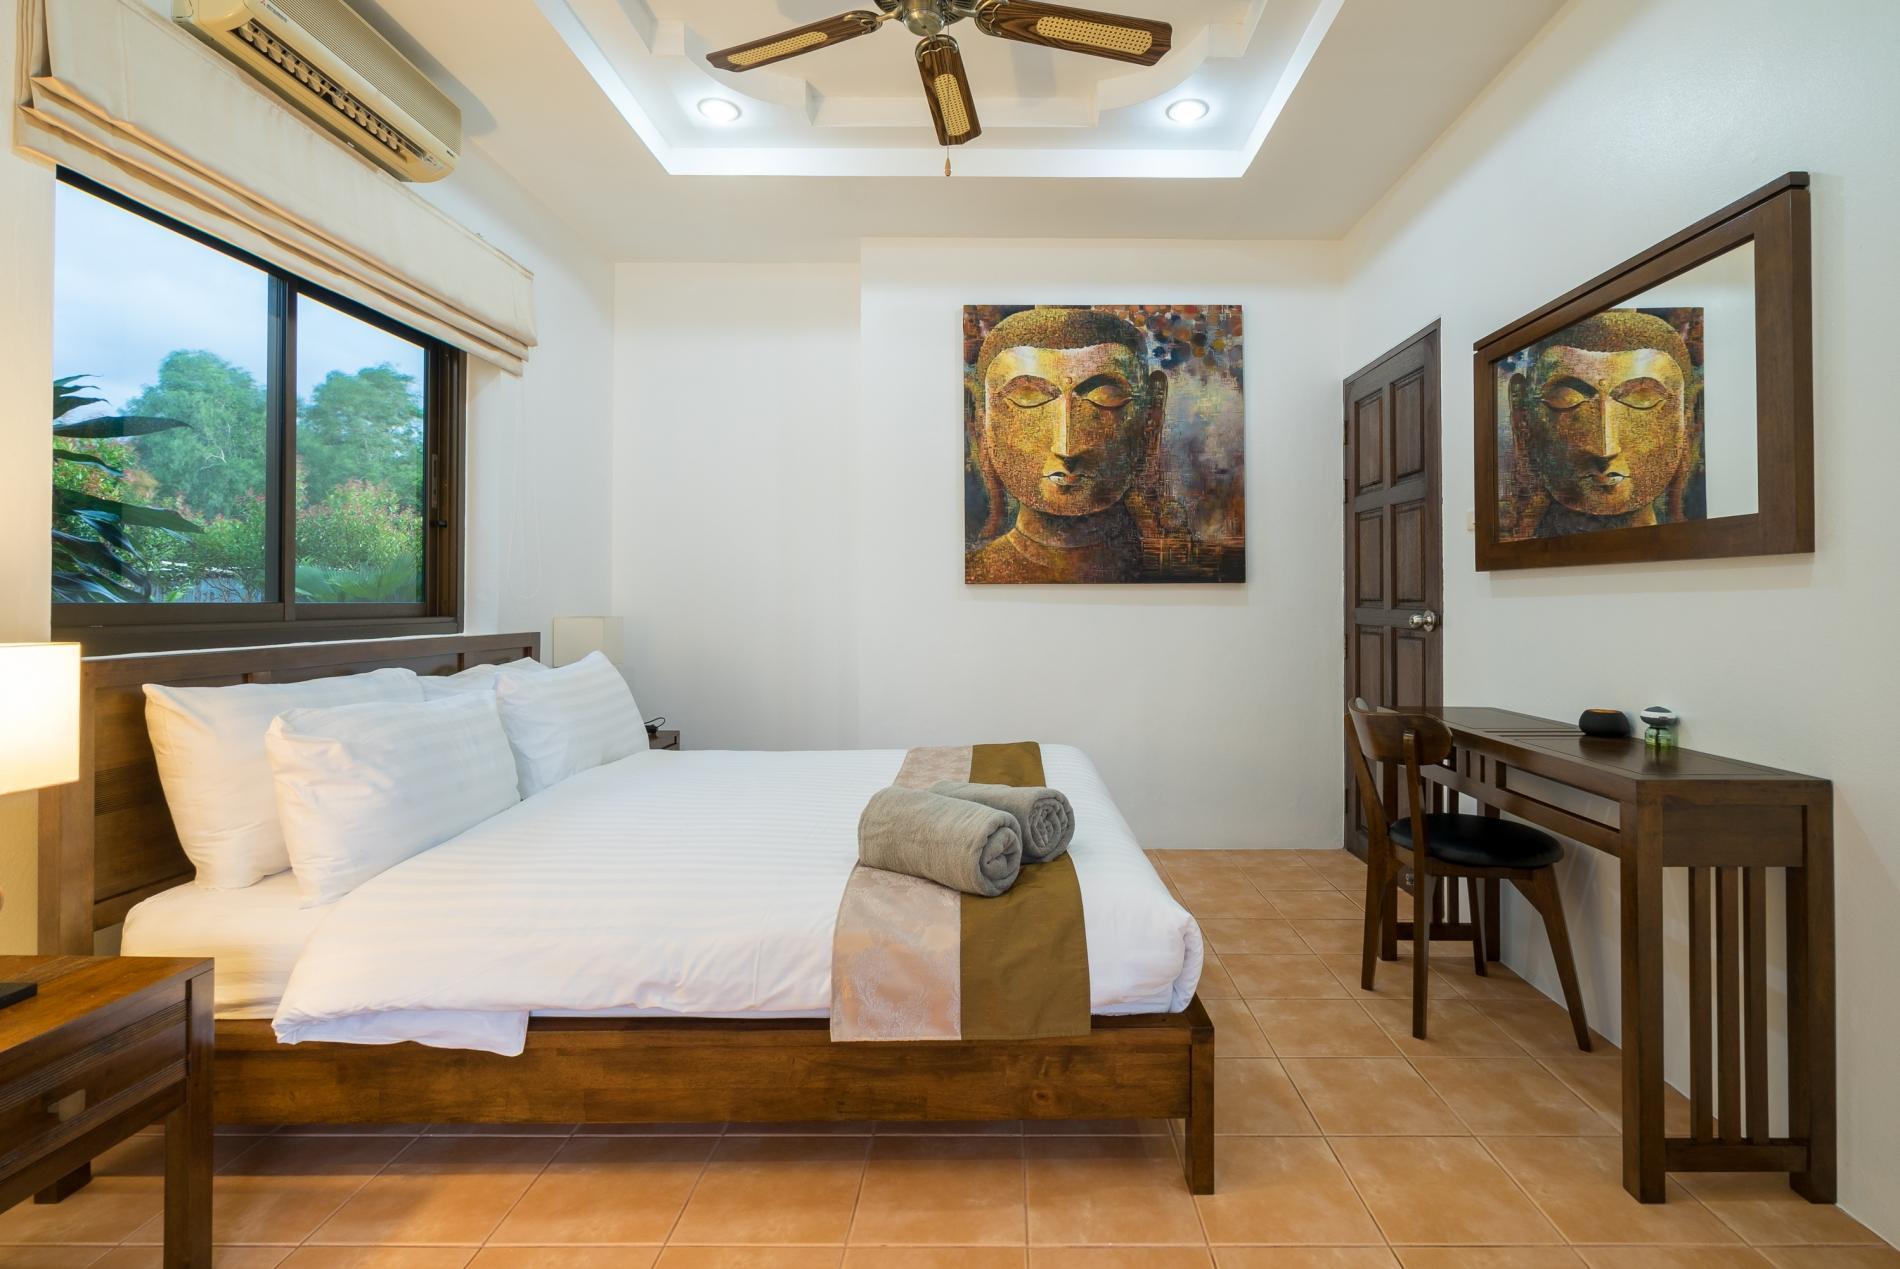 Pasak soi 3 - Convenient pool villa in quiet location, near Laguna, Boat avenue photo 8142496